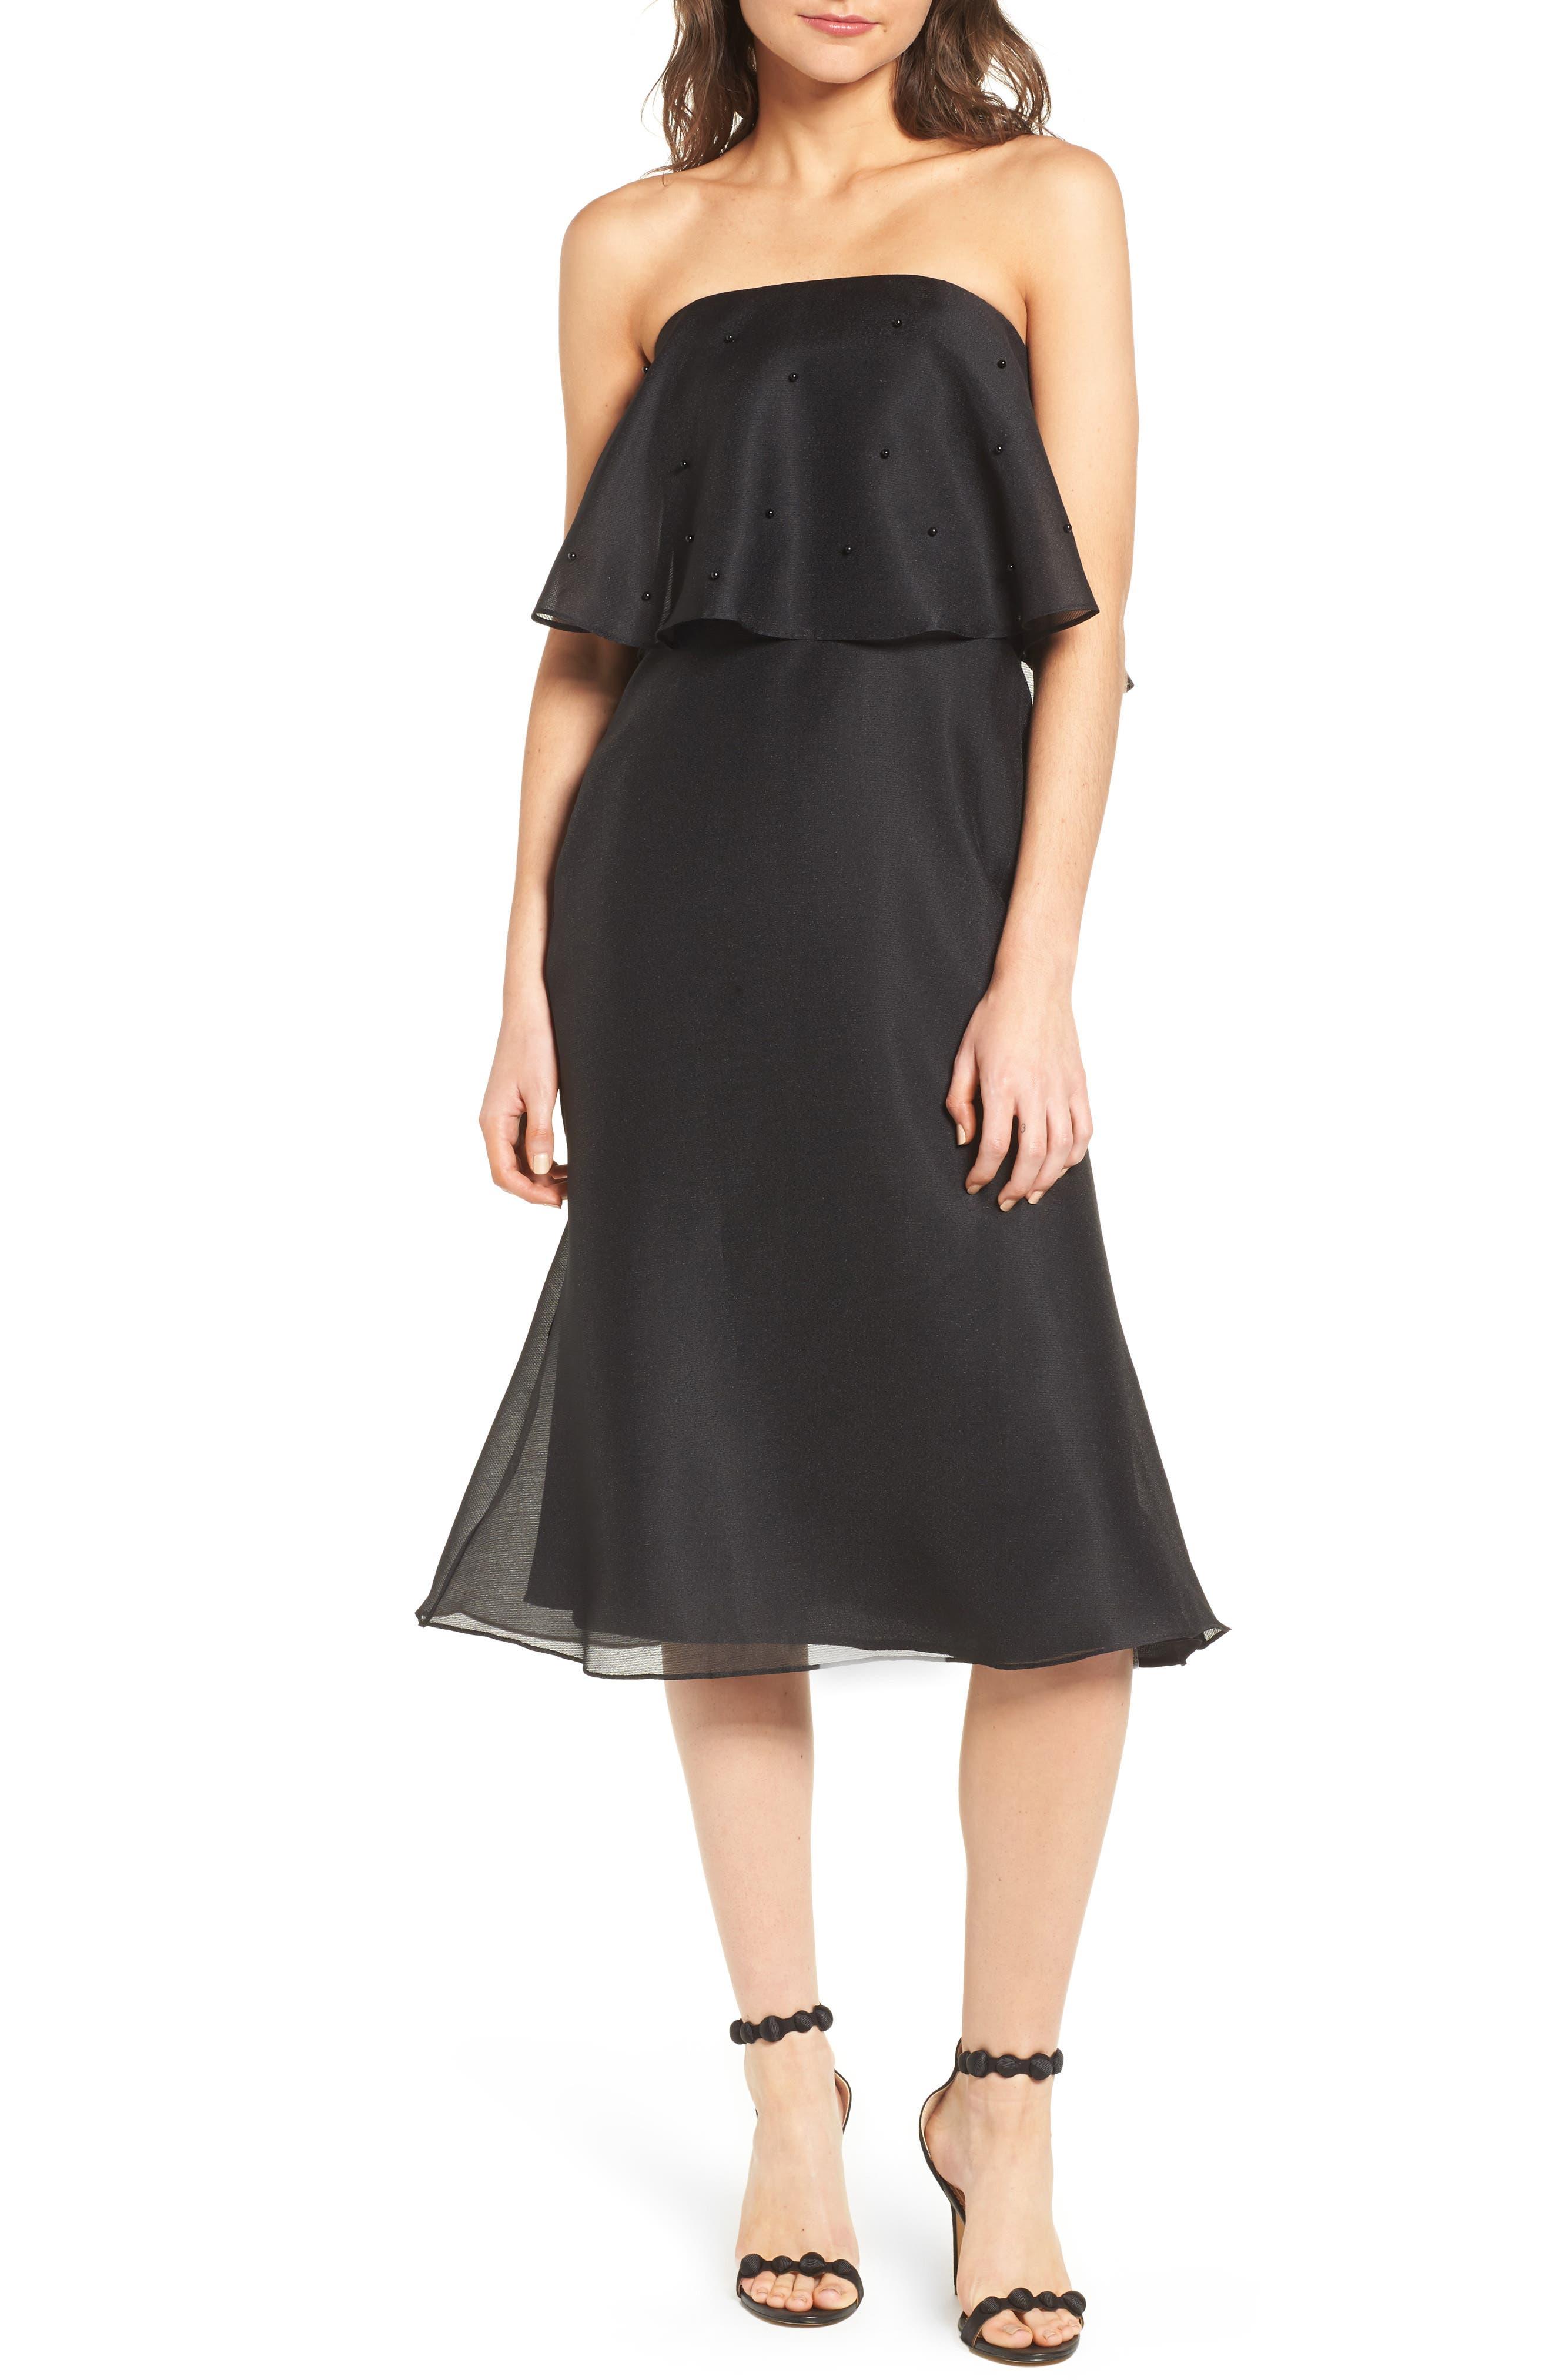 Call Me Strapless Dress,                         Main,                         color, 001